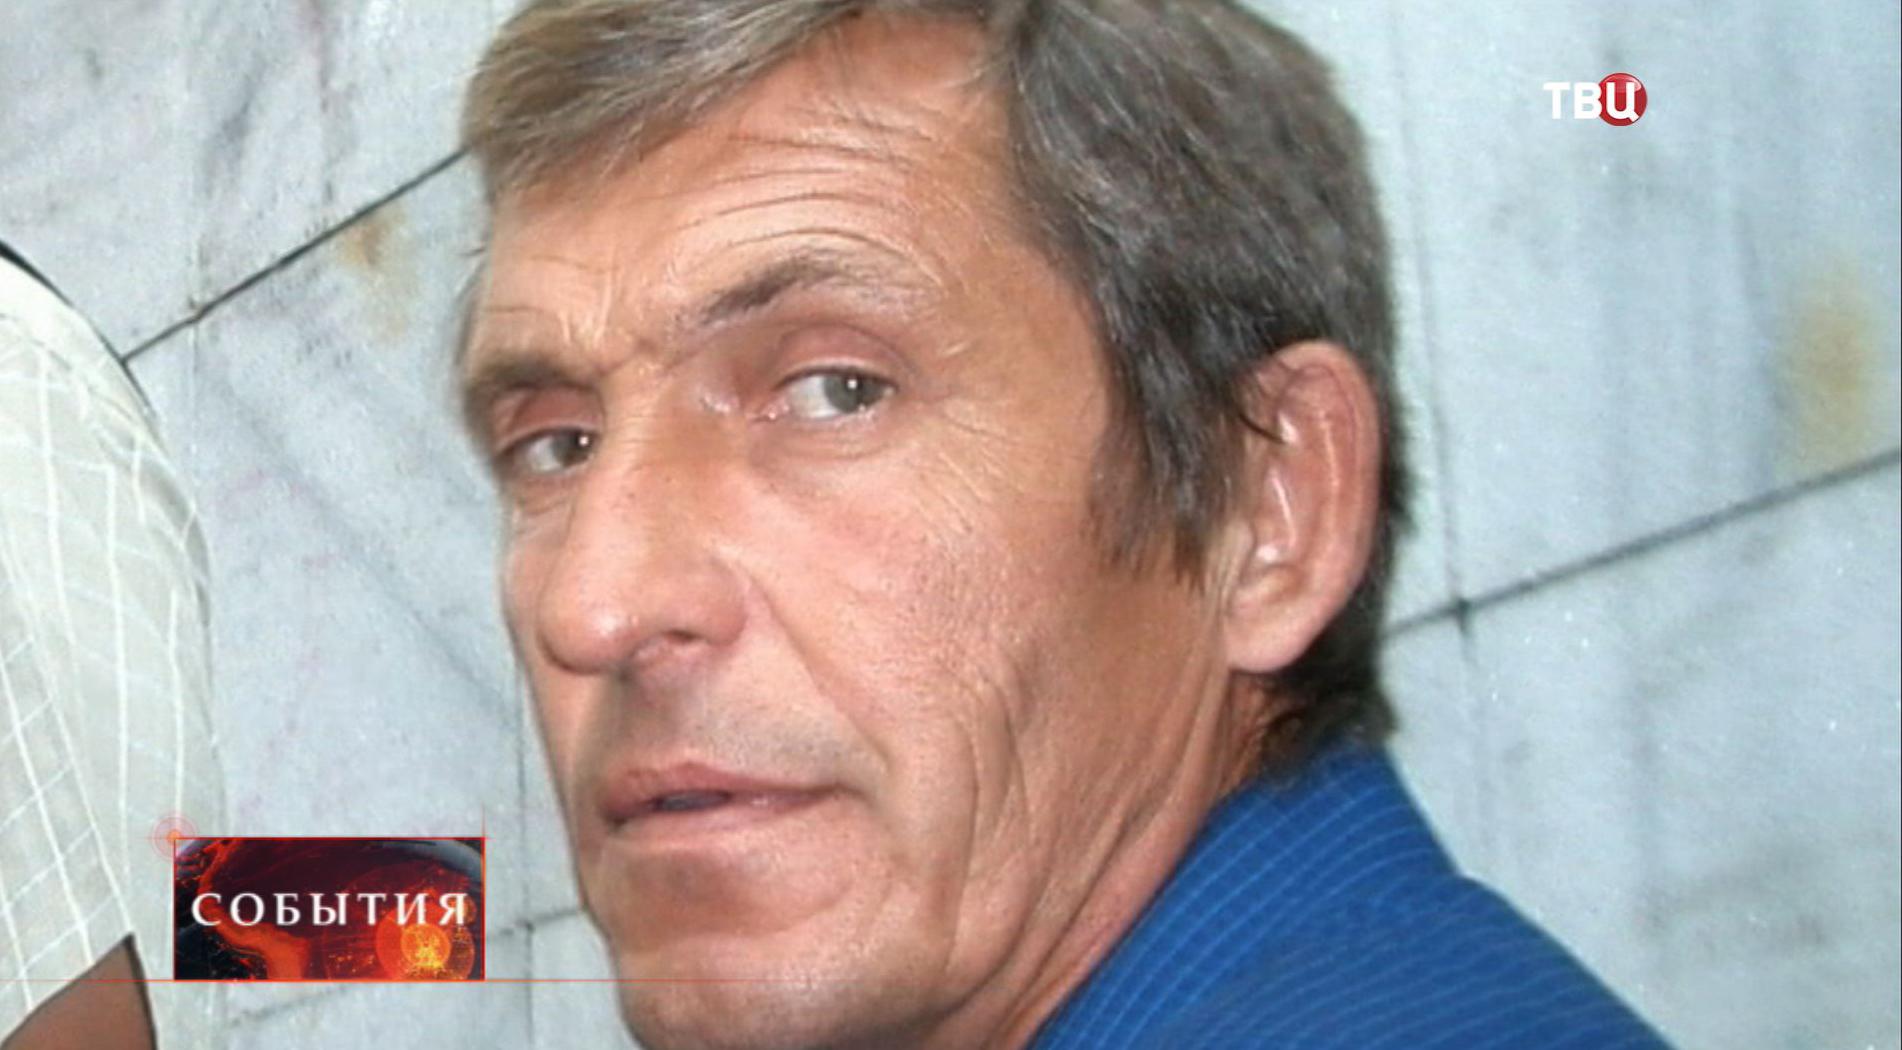 Оператор Первого канала Анатолий Клян